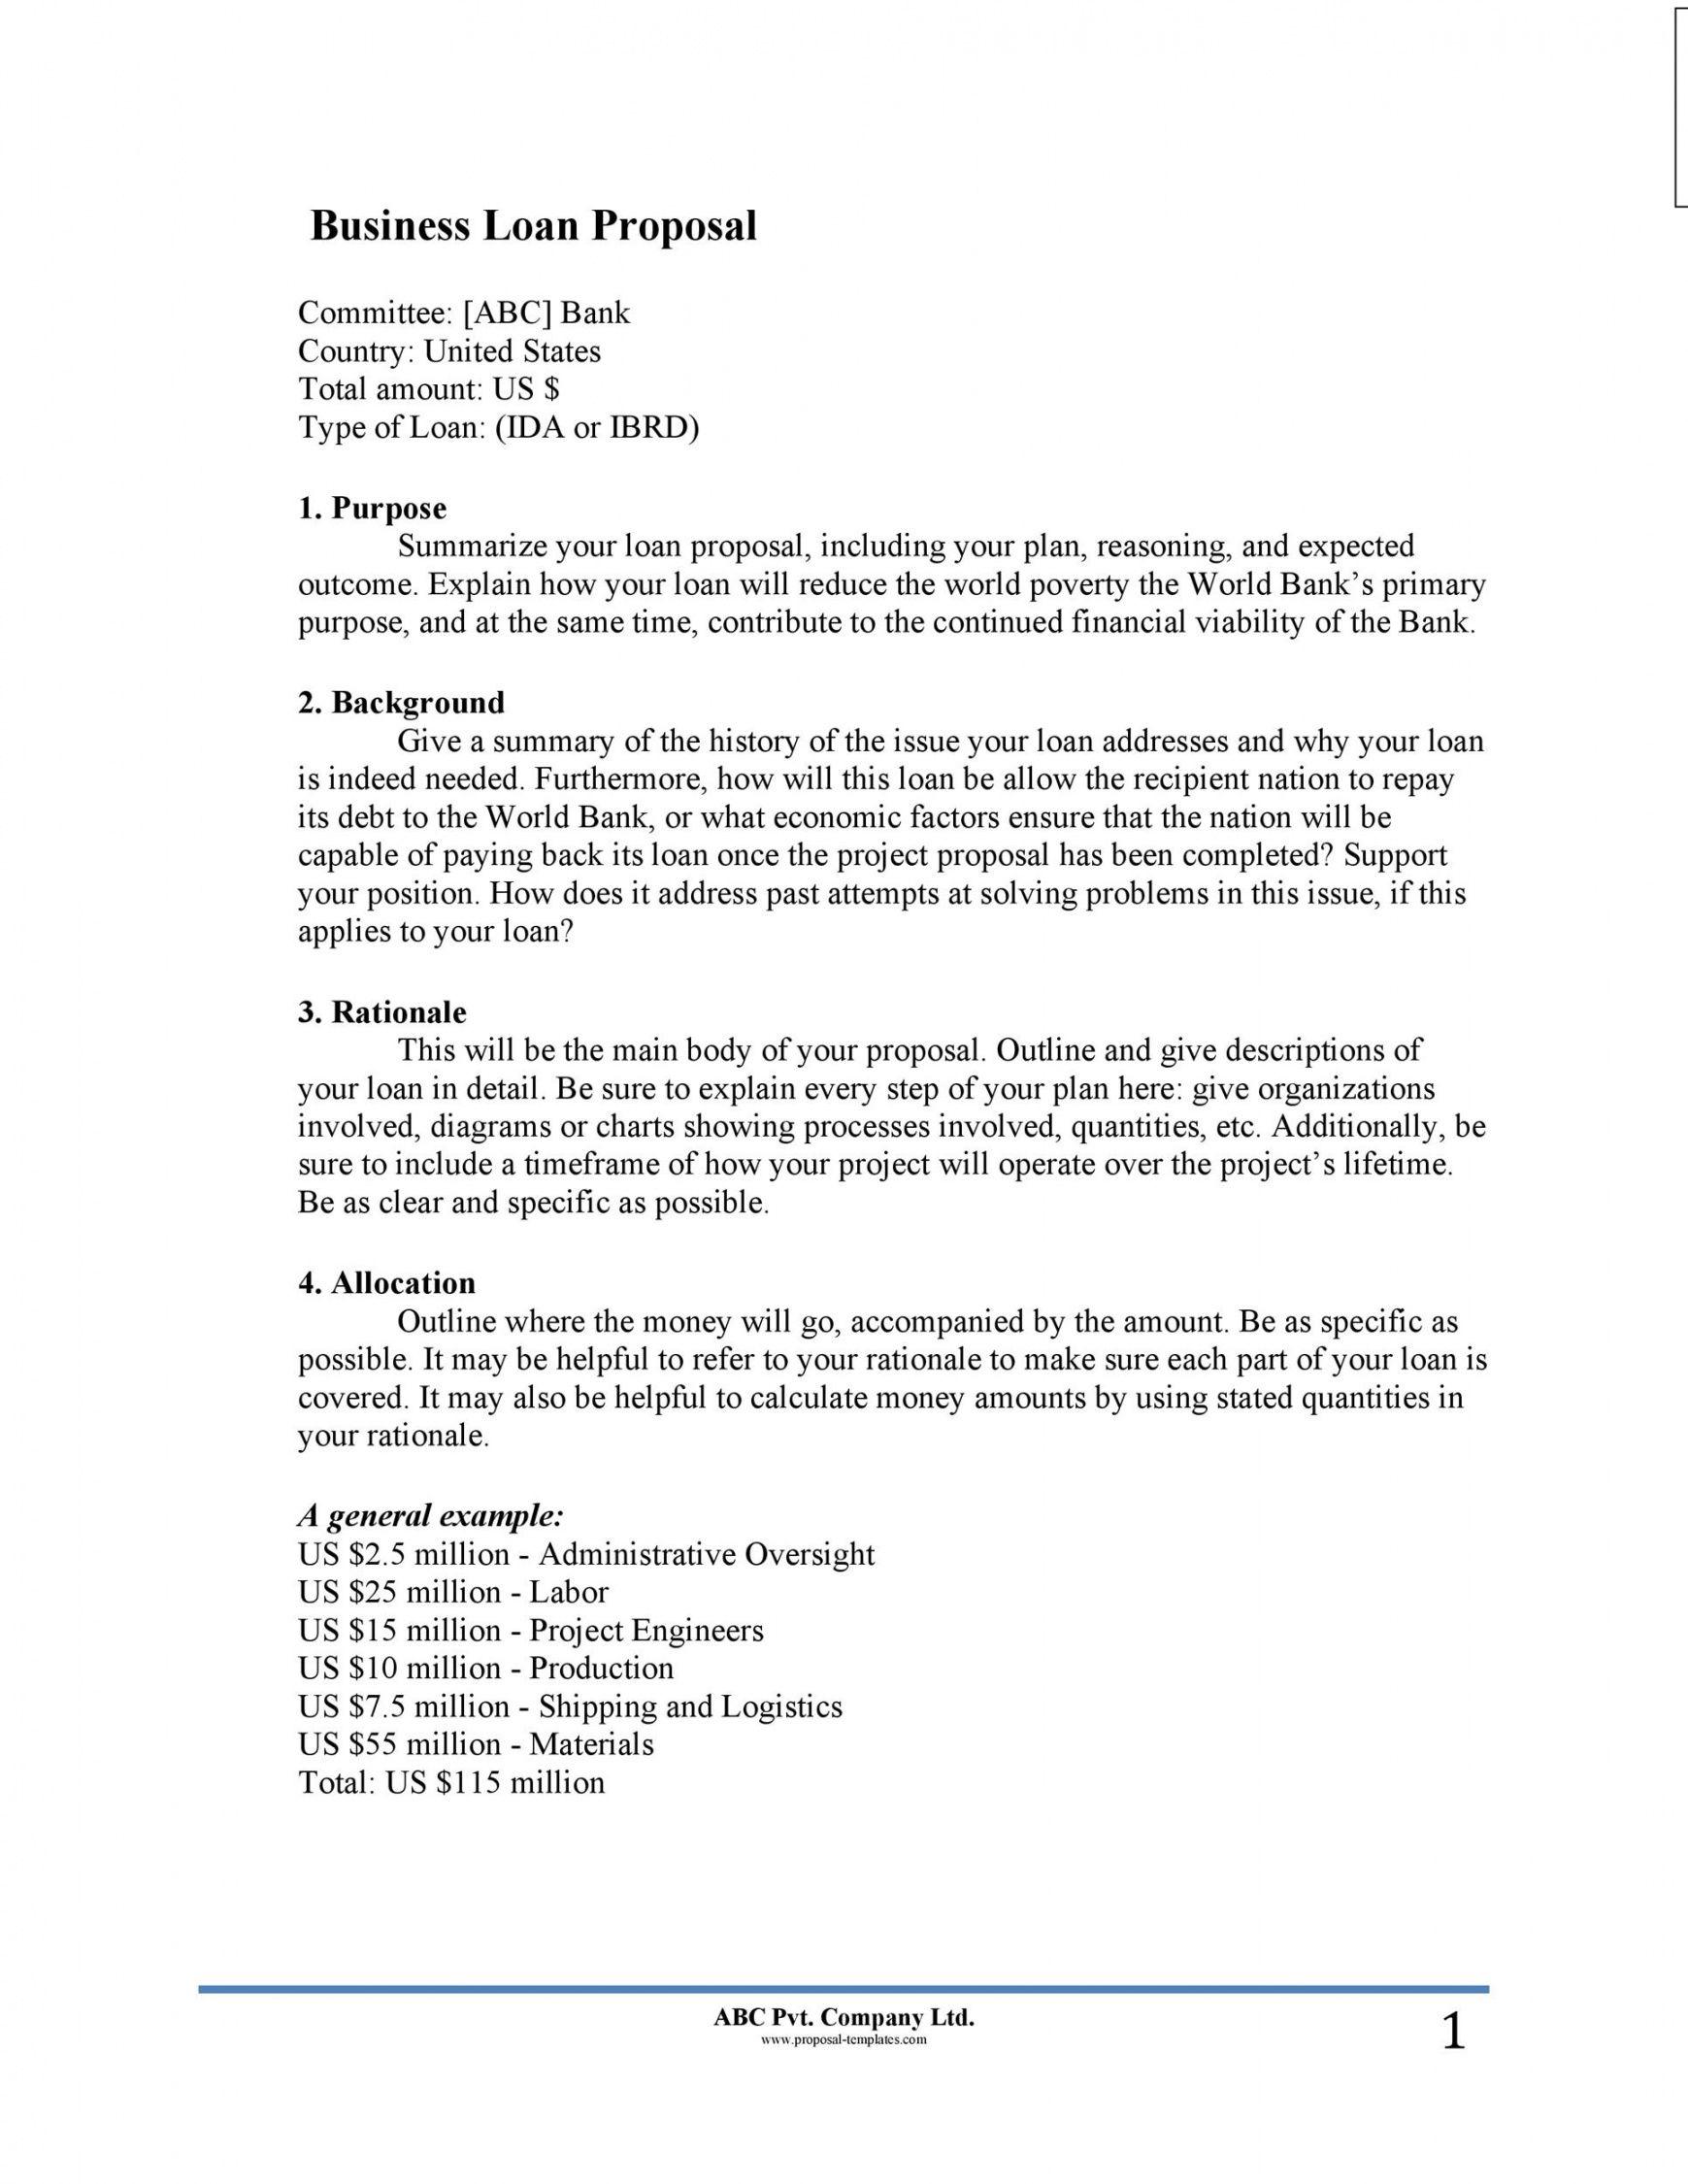 30 business proposal templates & proposal letter samples selling business proposal template example